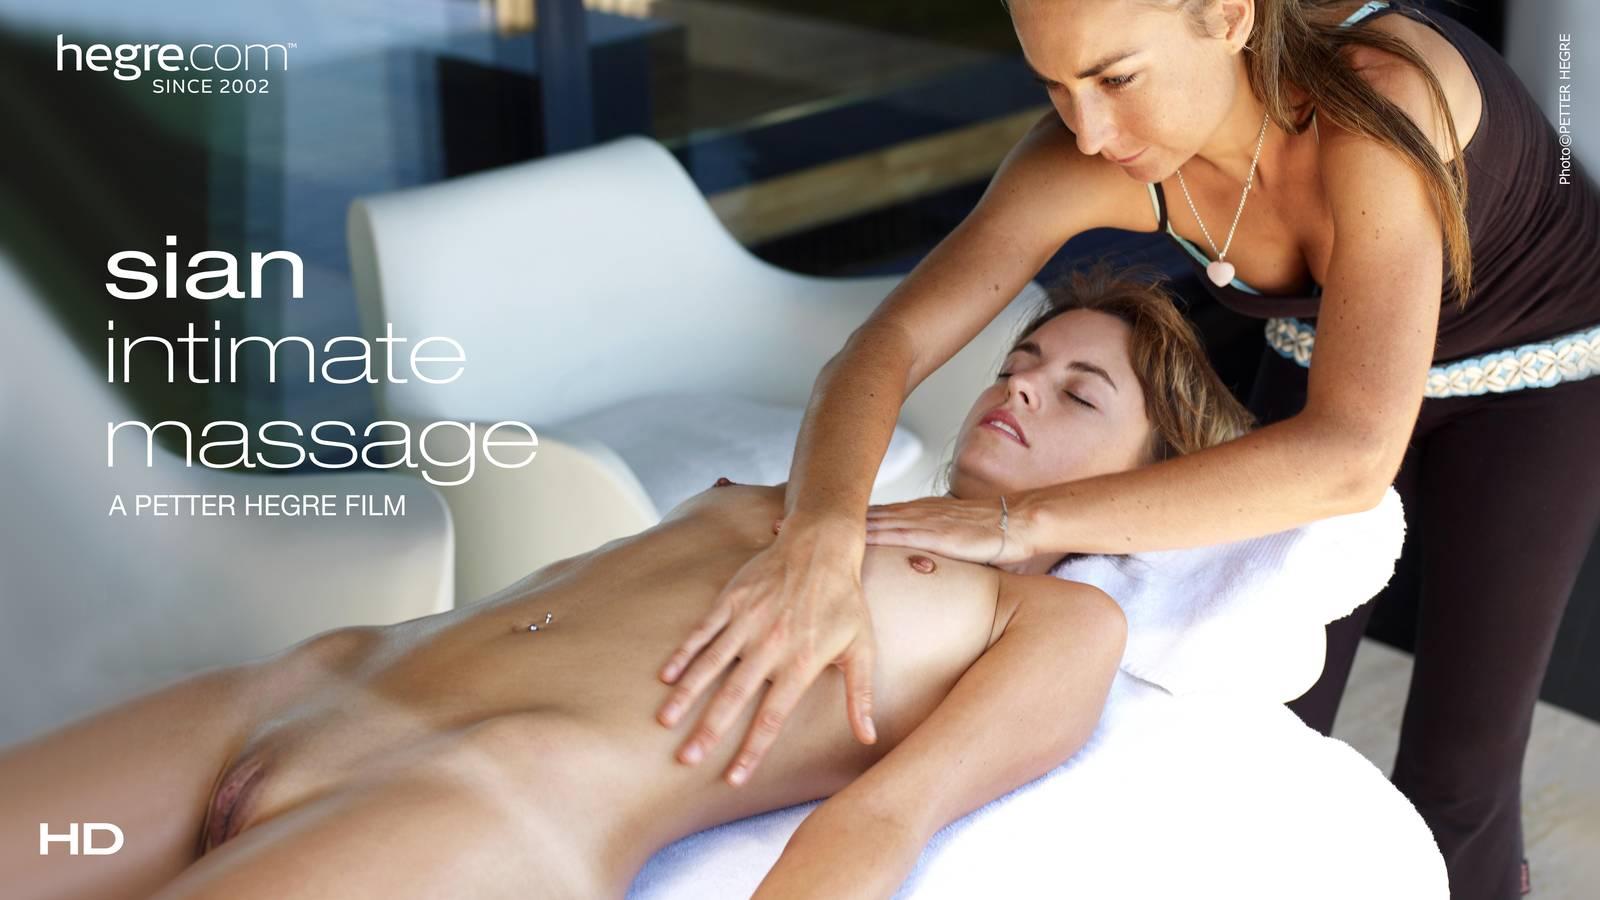 Intime Massagen